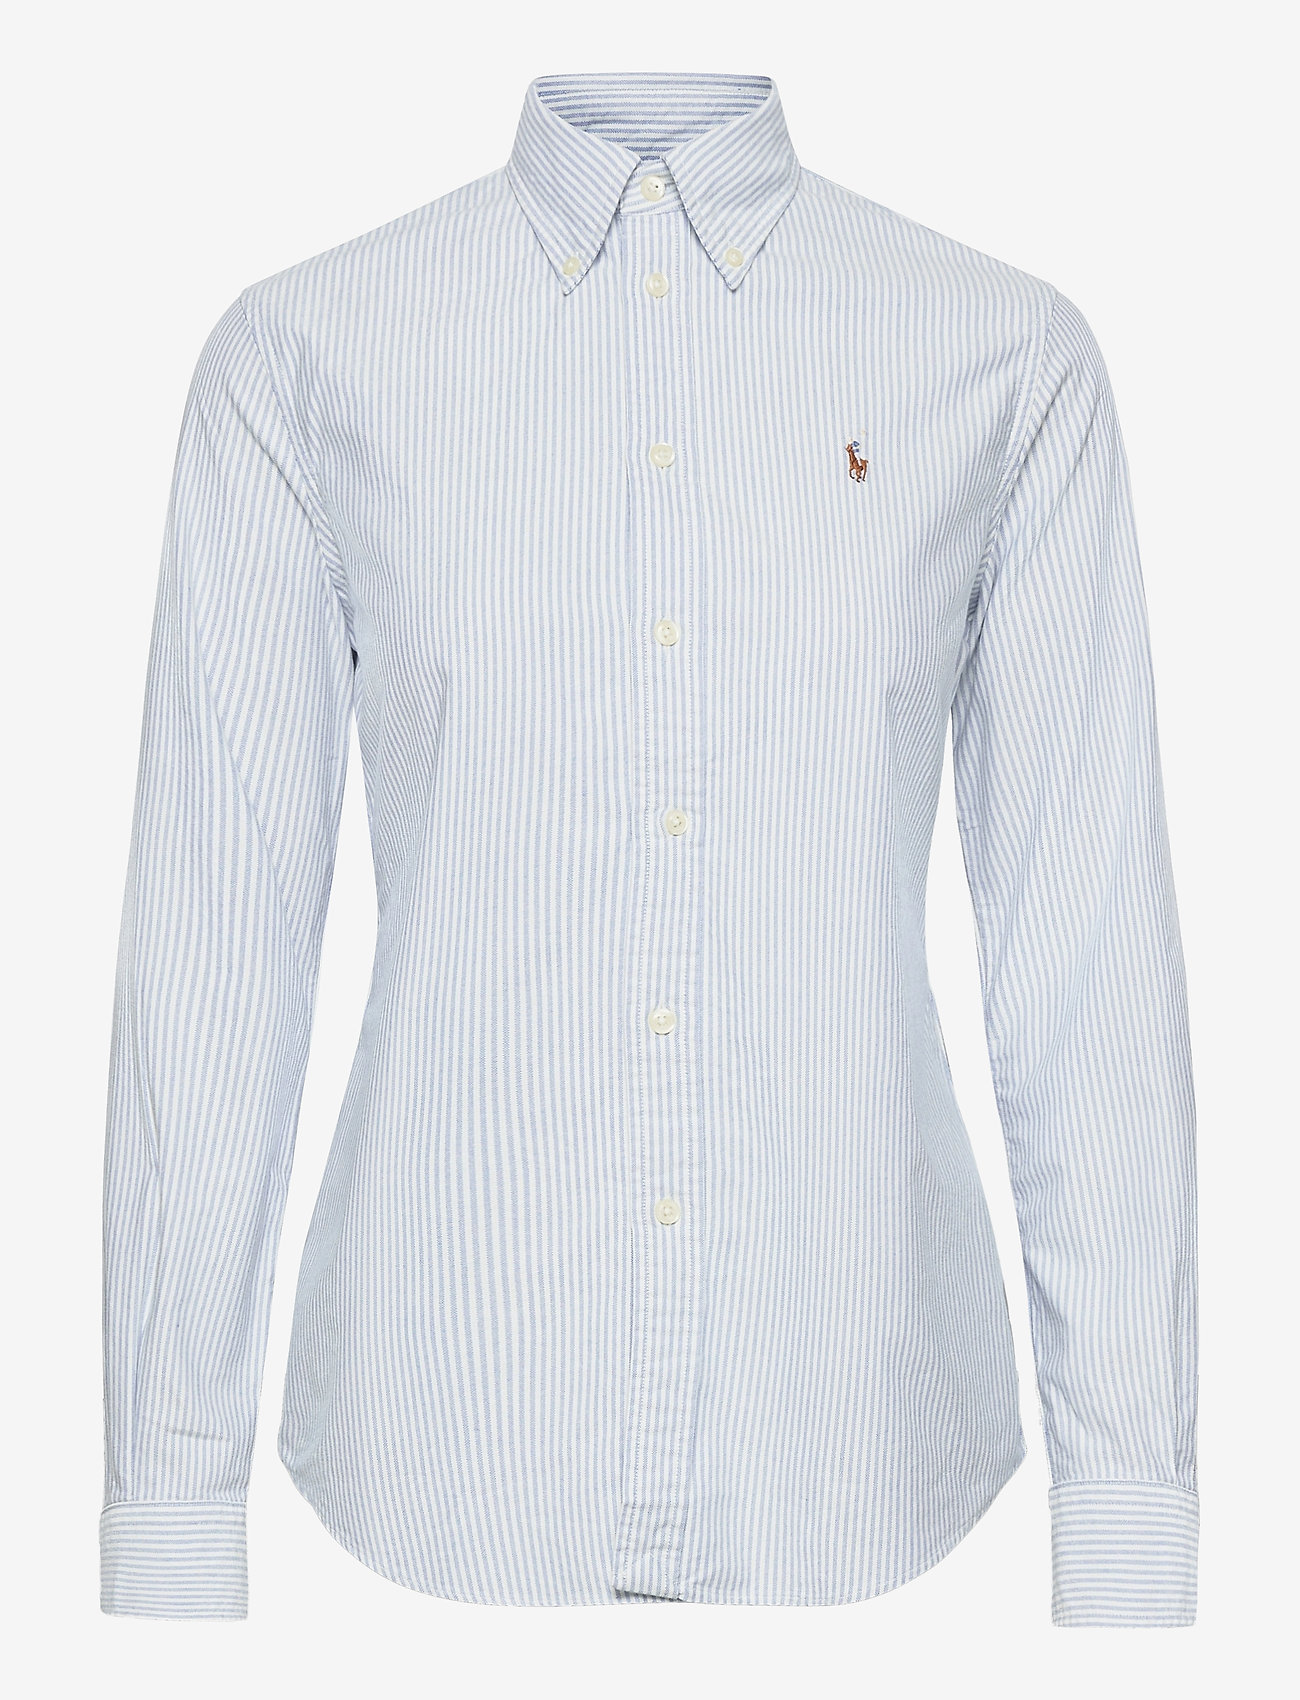 Polo Ralph Lauren - Slim Fit Cotton Oxford Shirt - long-sleeved shirts - bsr blue/white - 0